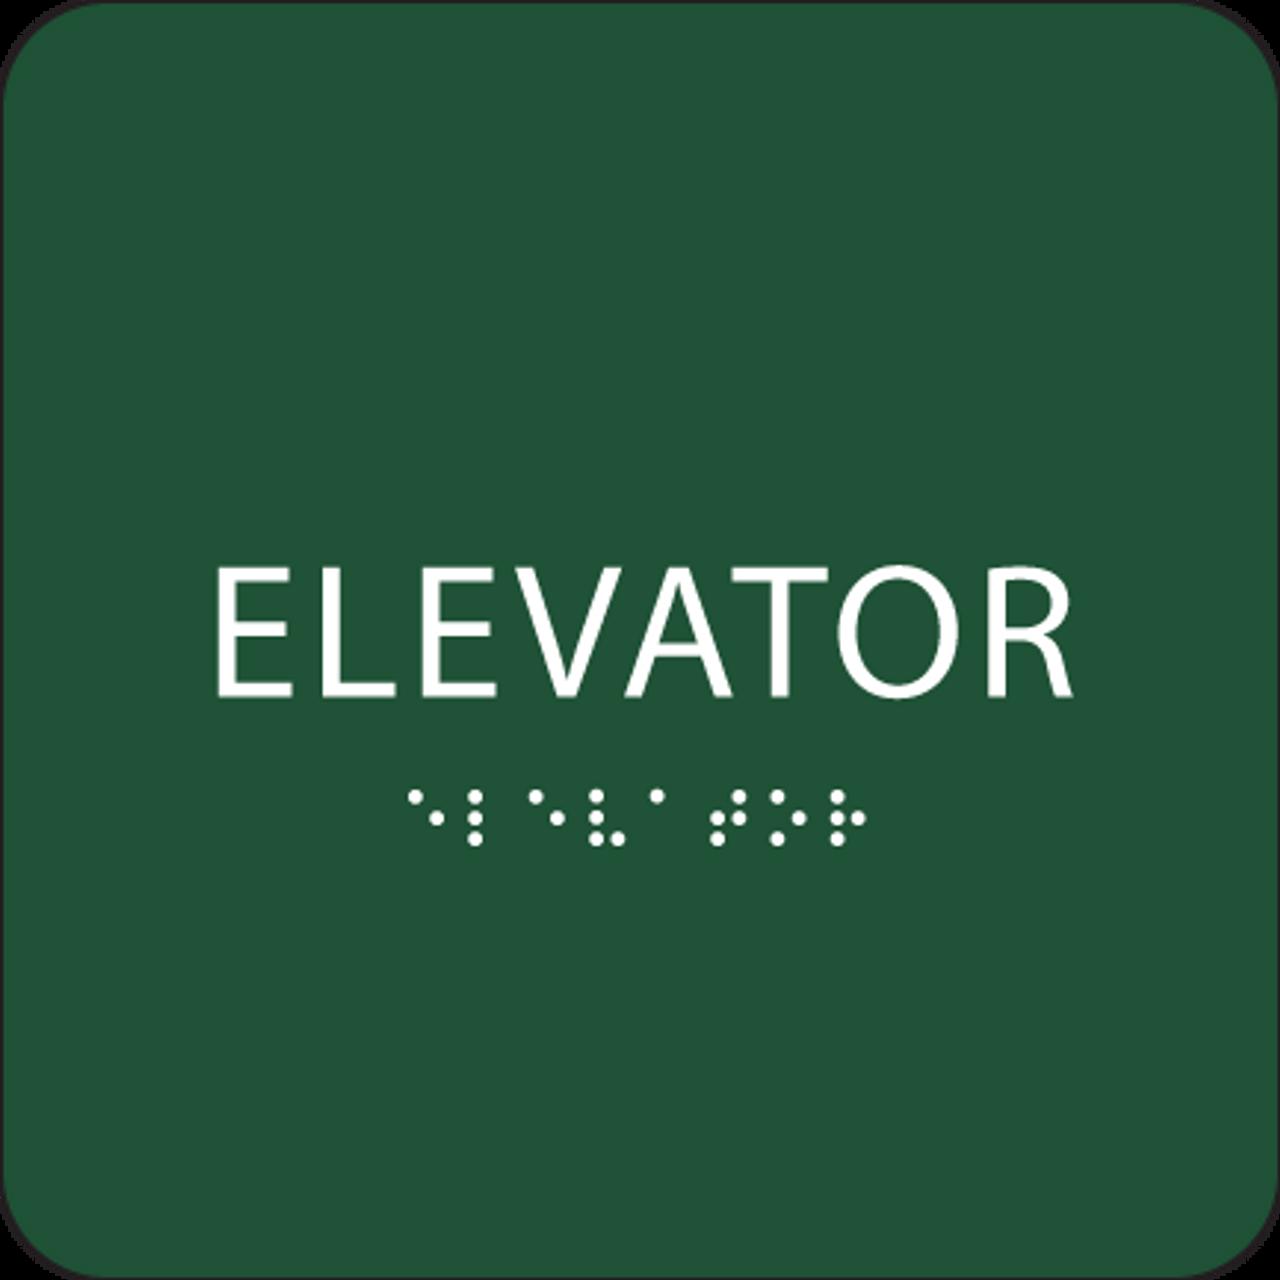 Green Tactile Elevator Sign